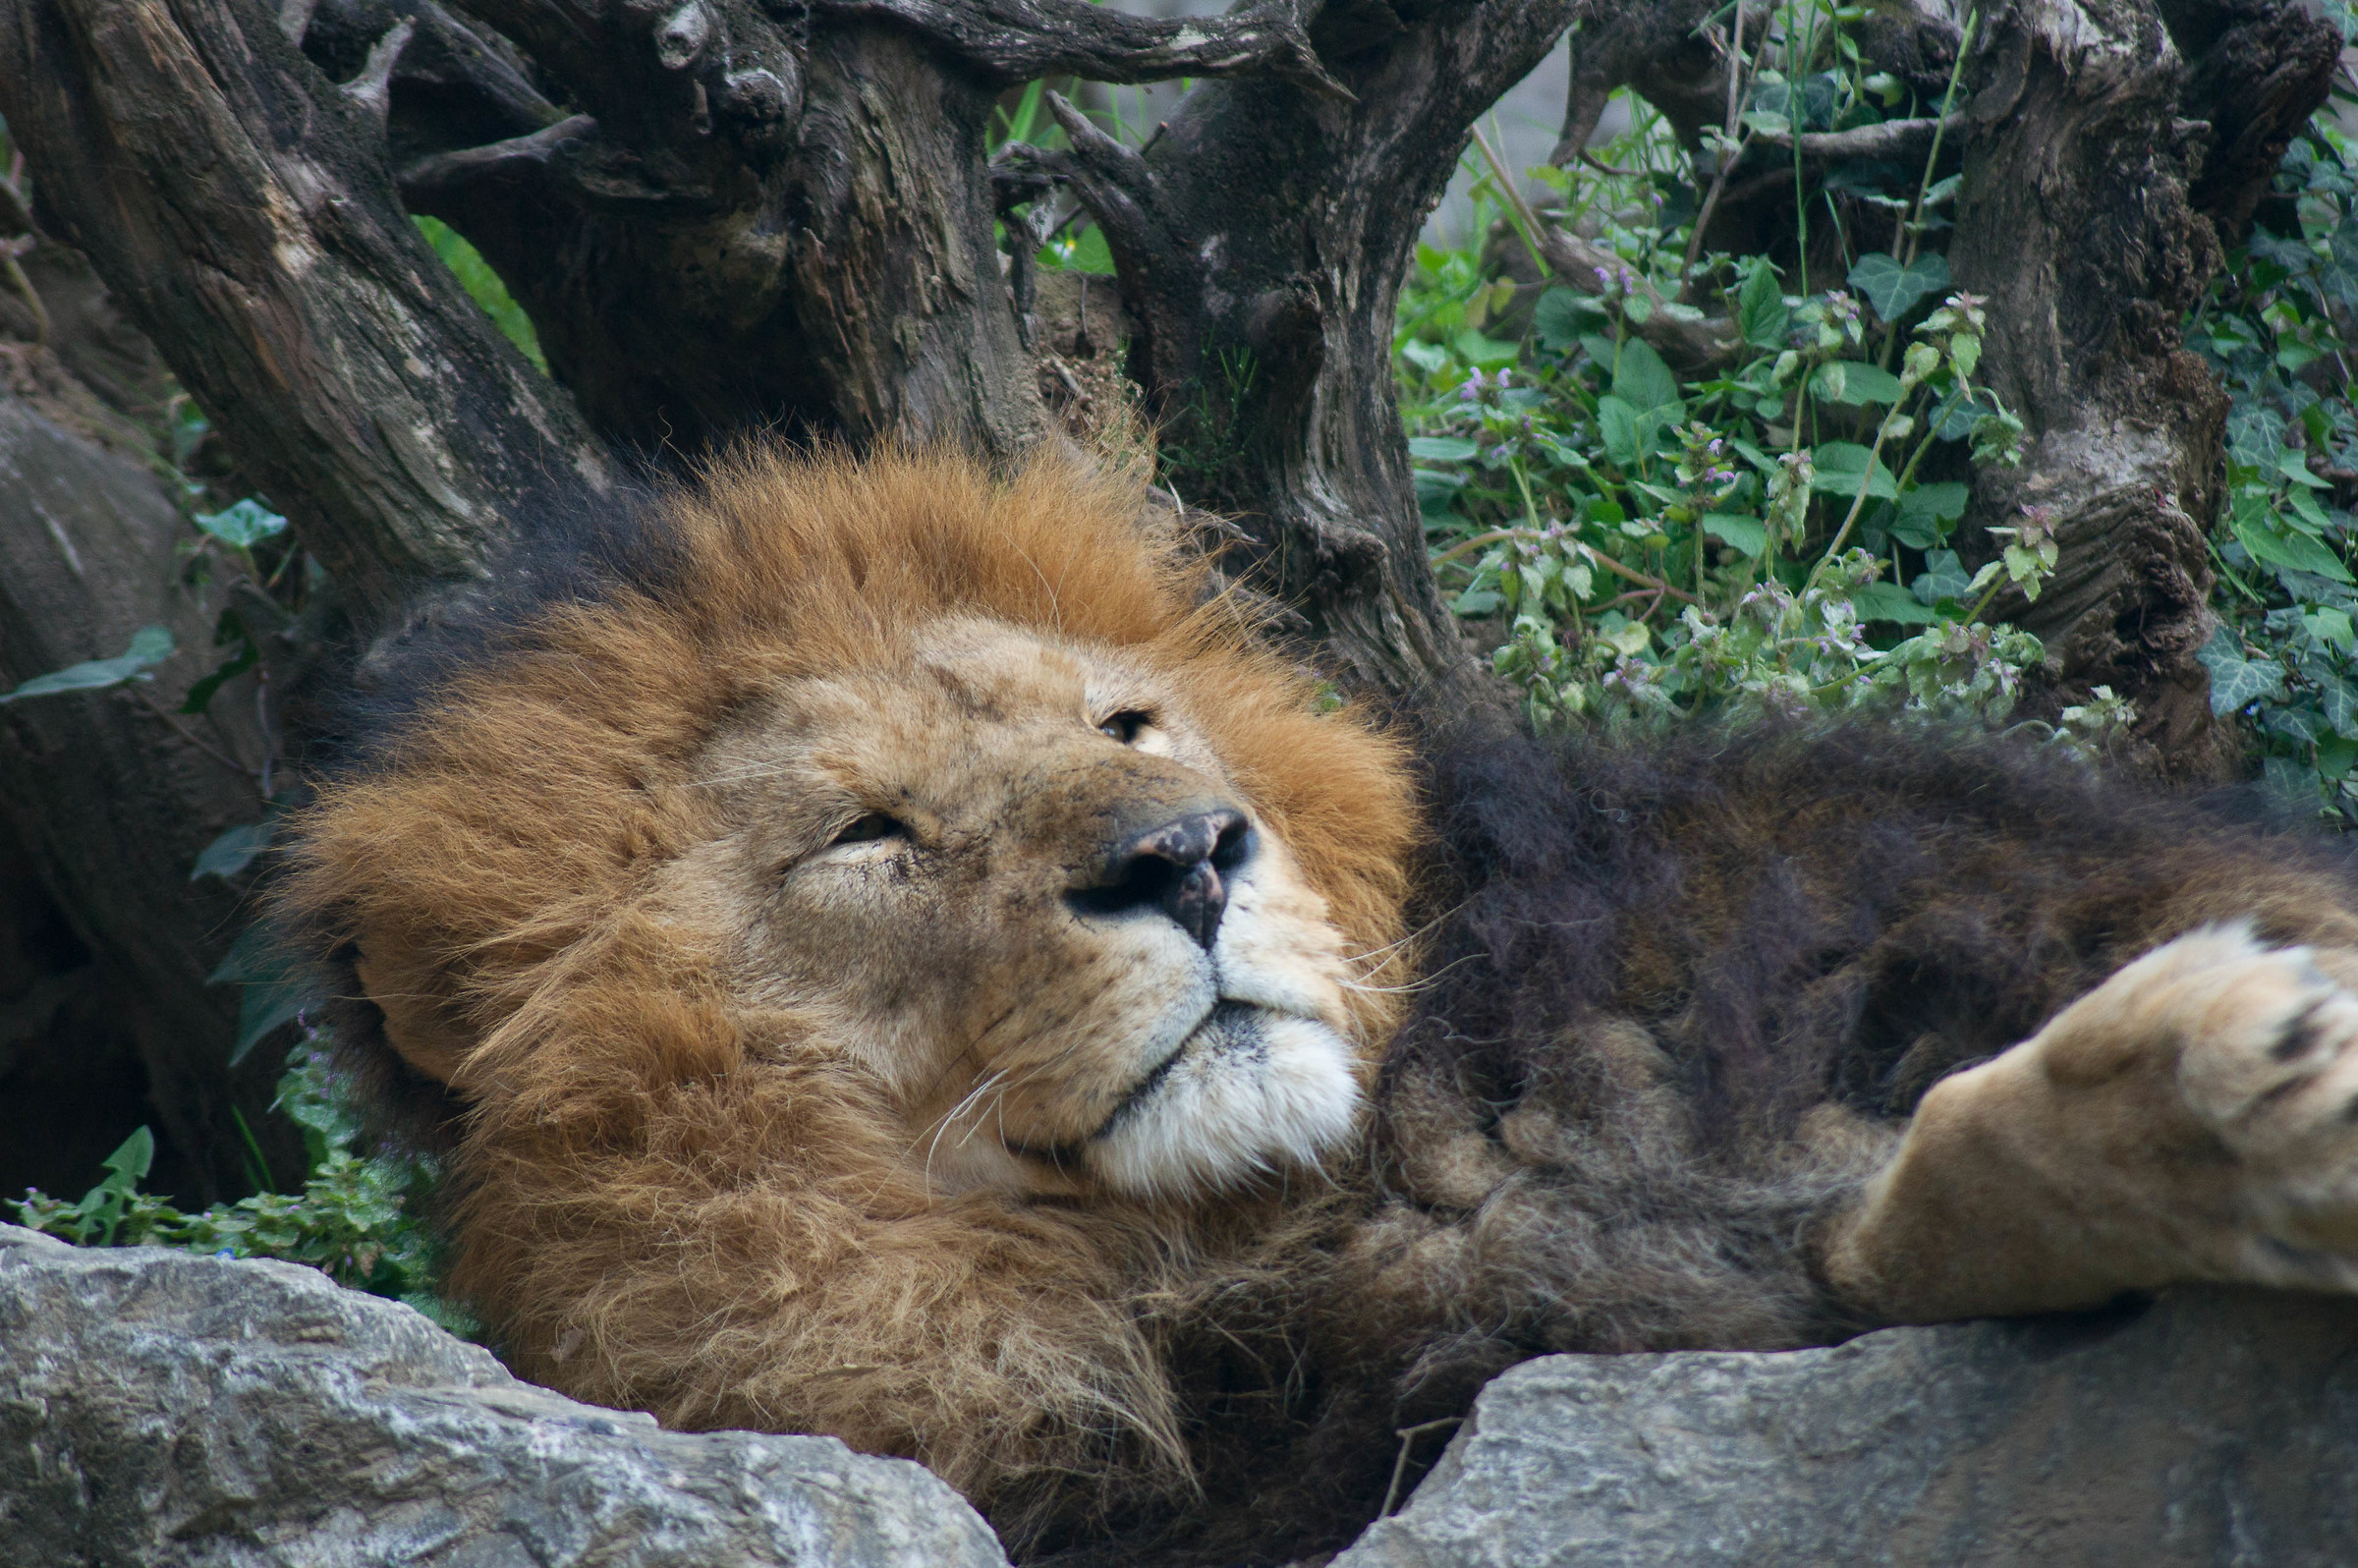 King rests...